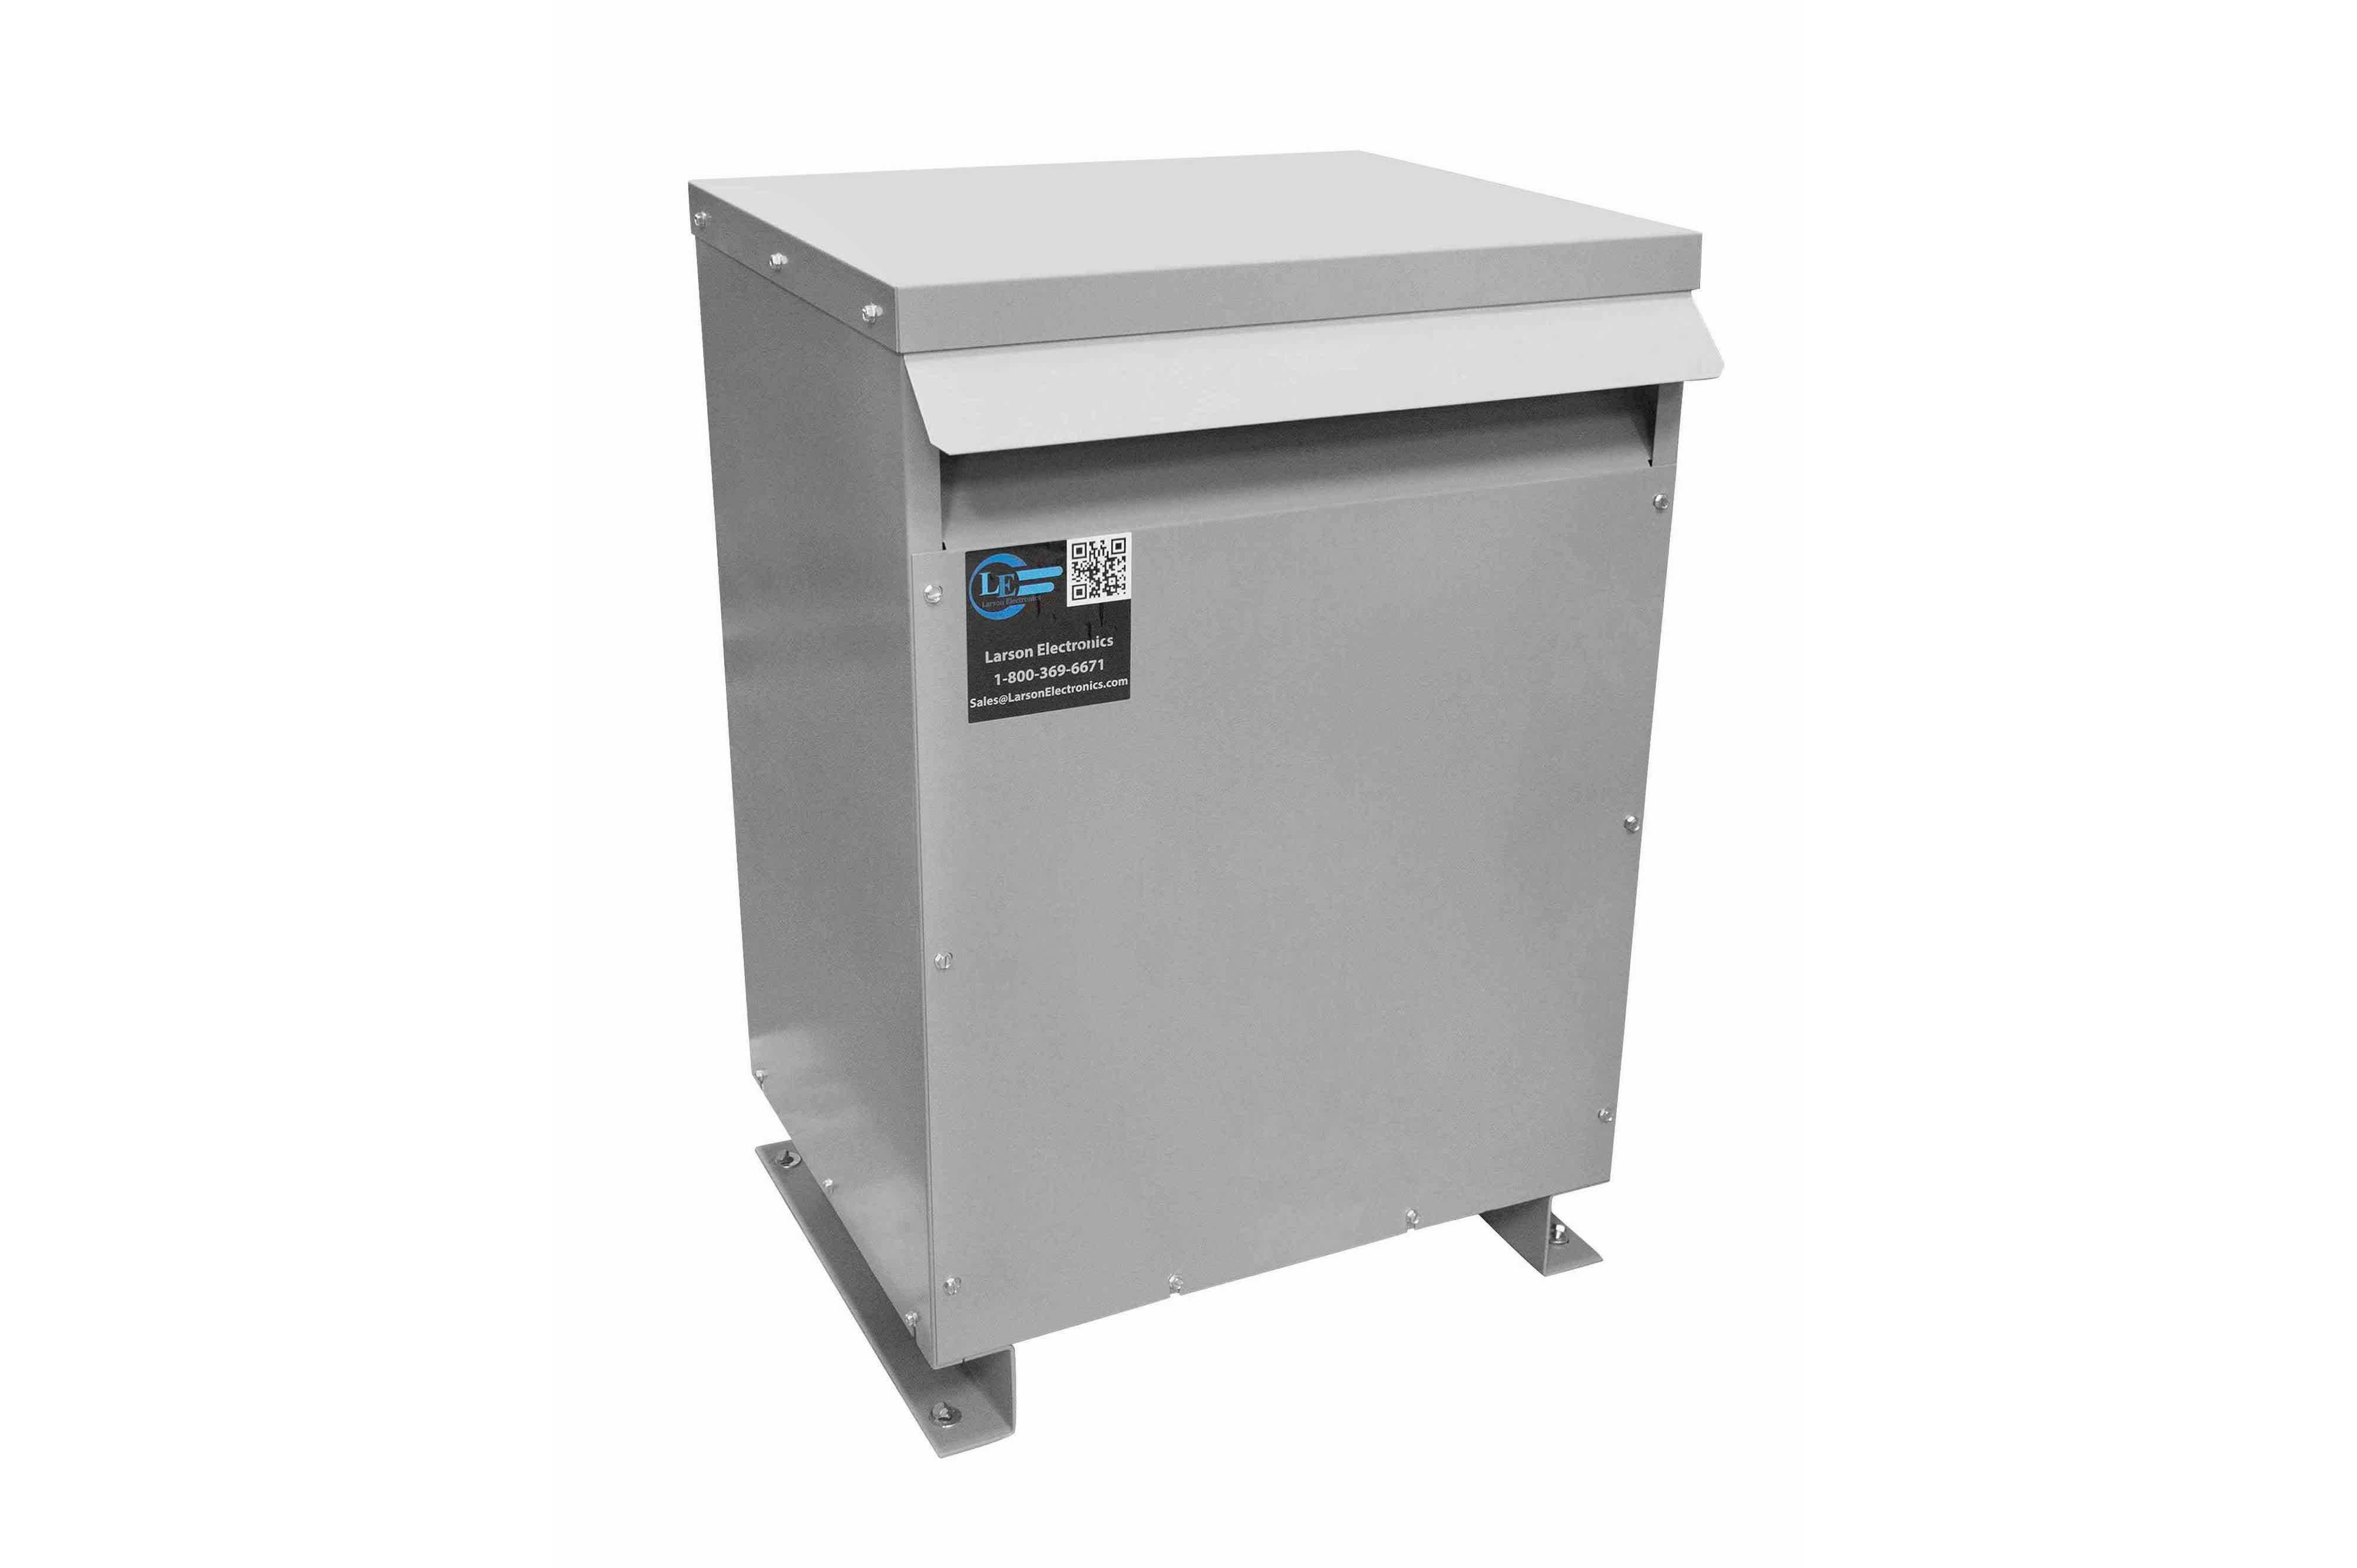 175 kVA 3PH Isolation Transformer, 480V Wye Primary, 575Y/332 Wye-N Secondary, N3R, Ventilated, 60 Hz